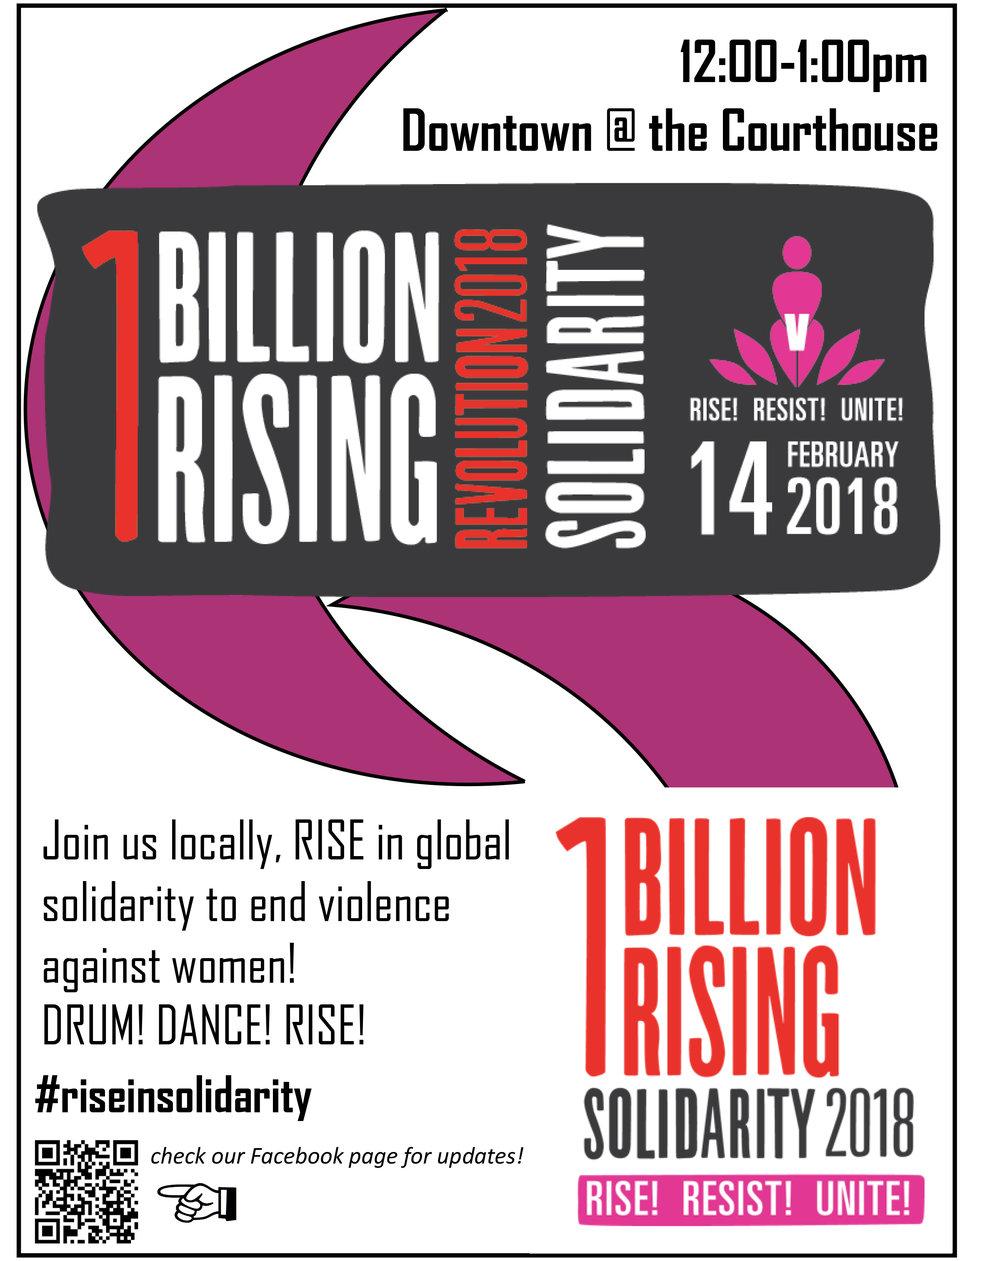 1 Billion Rising in Solidarity